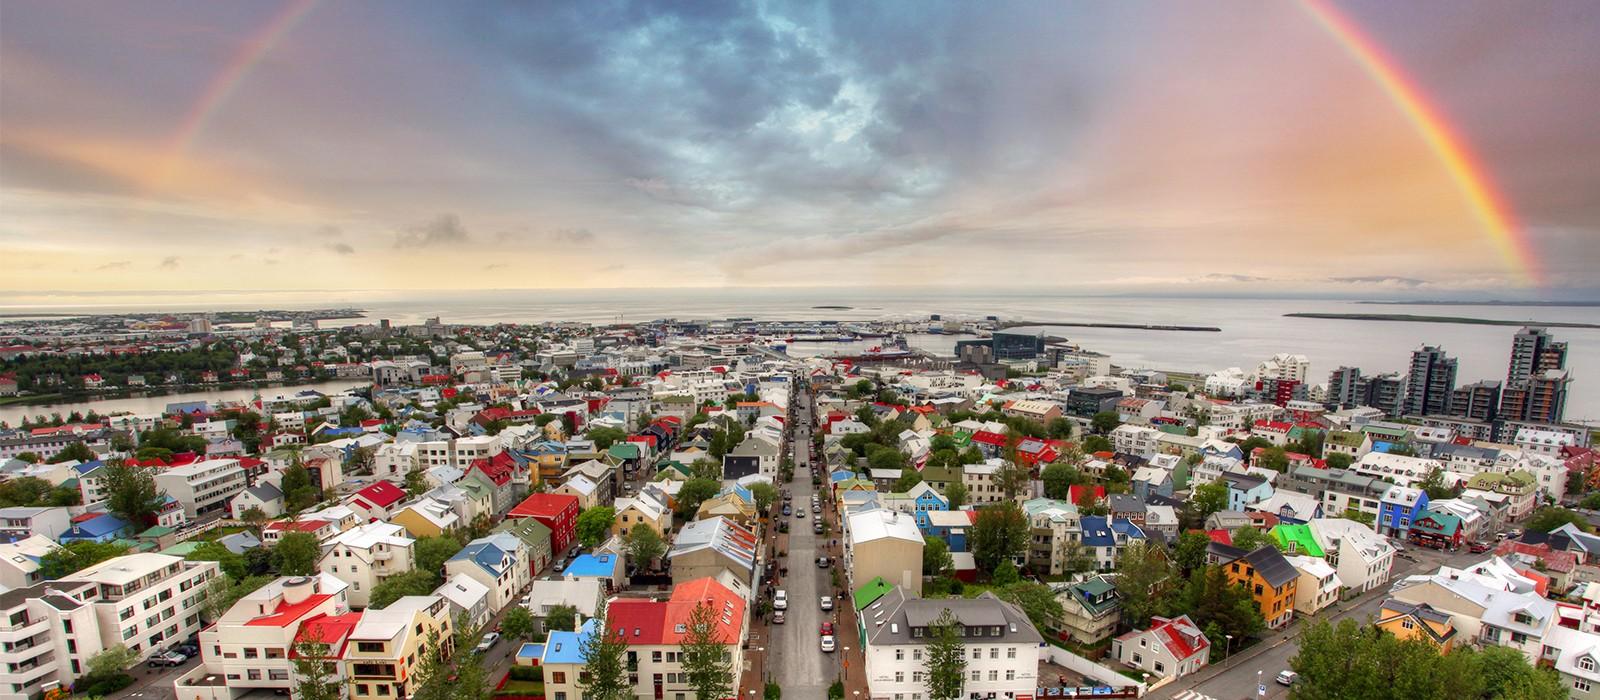 header - Radisson Blu Saga Hotel Reykjavik - Luxury Iceland Holiday Packages